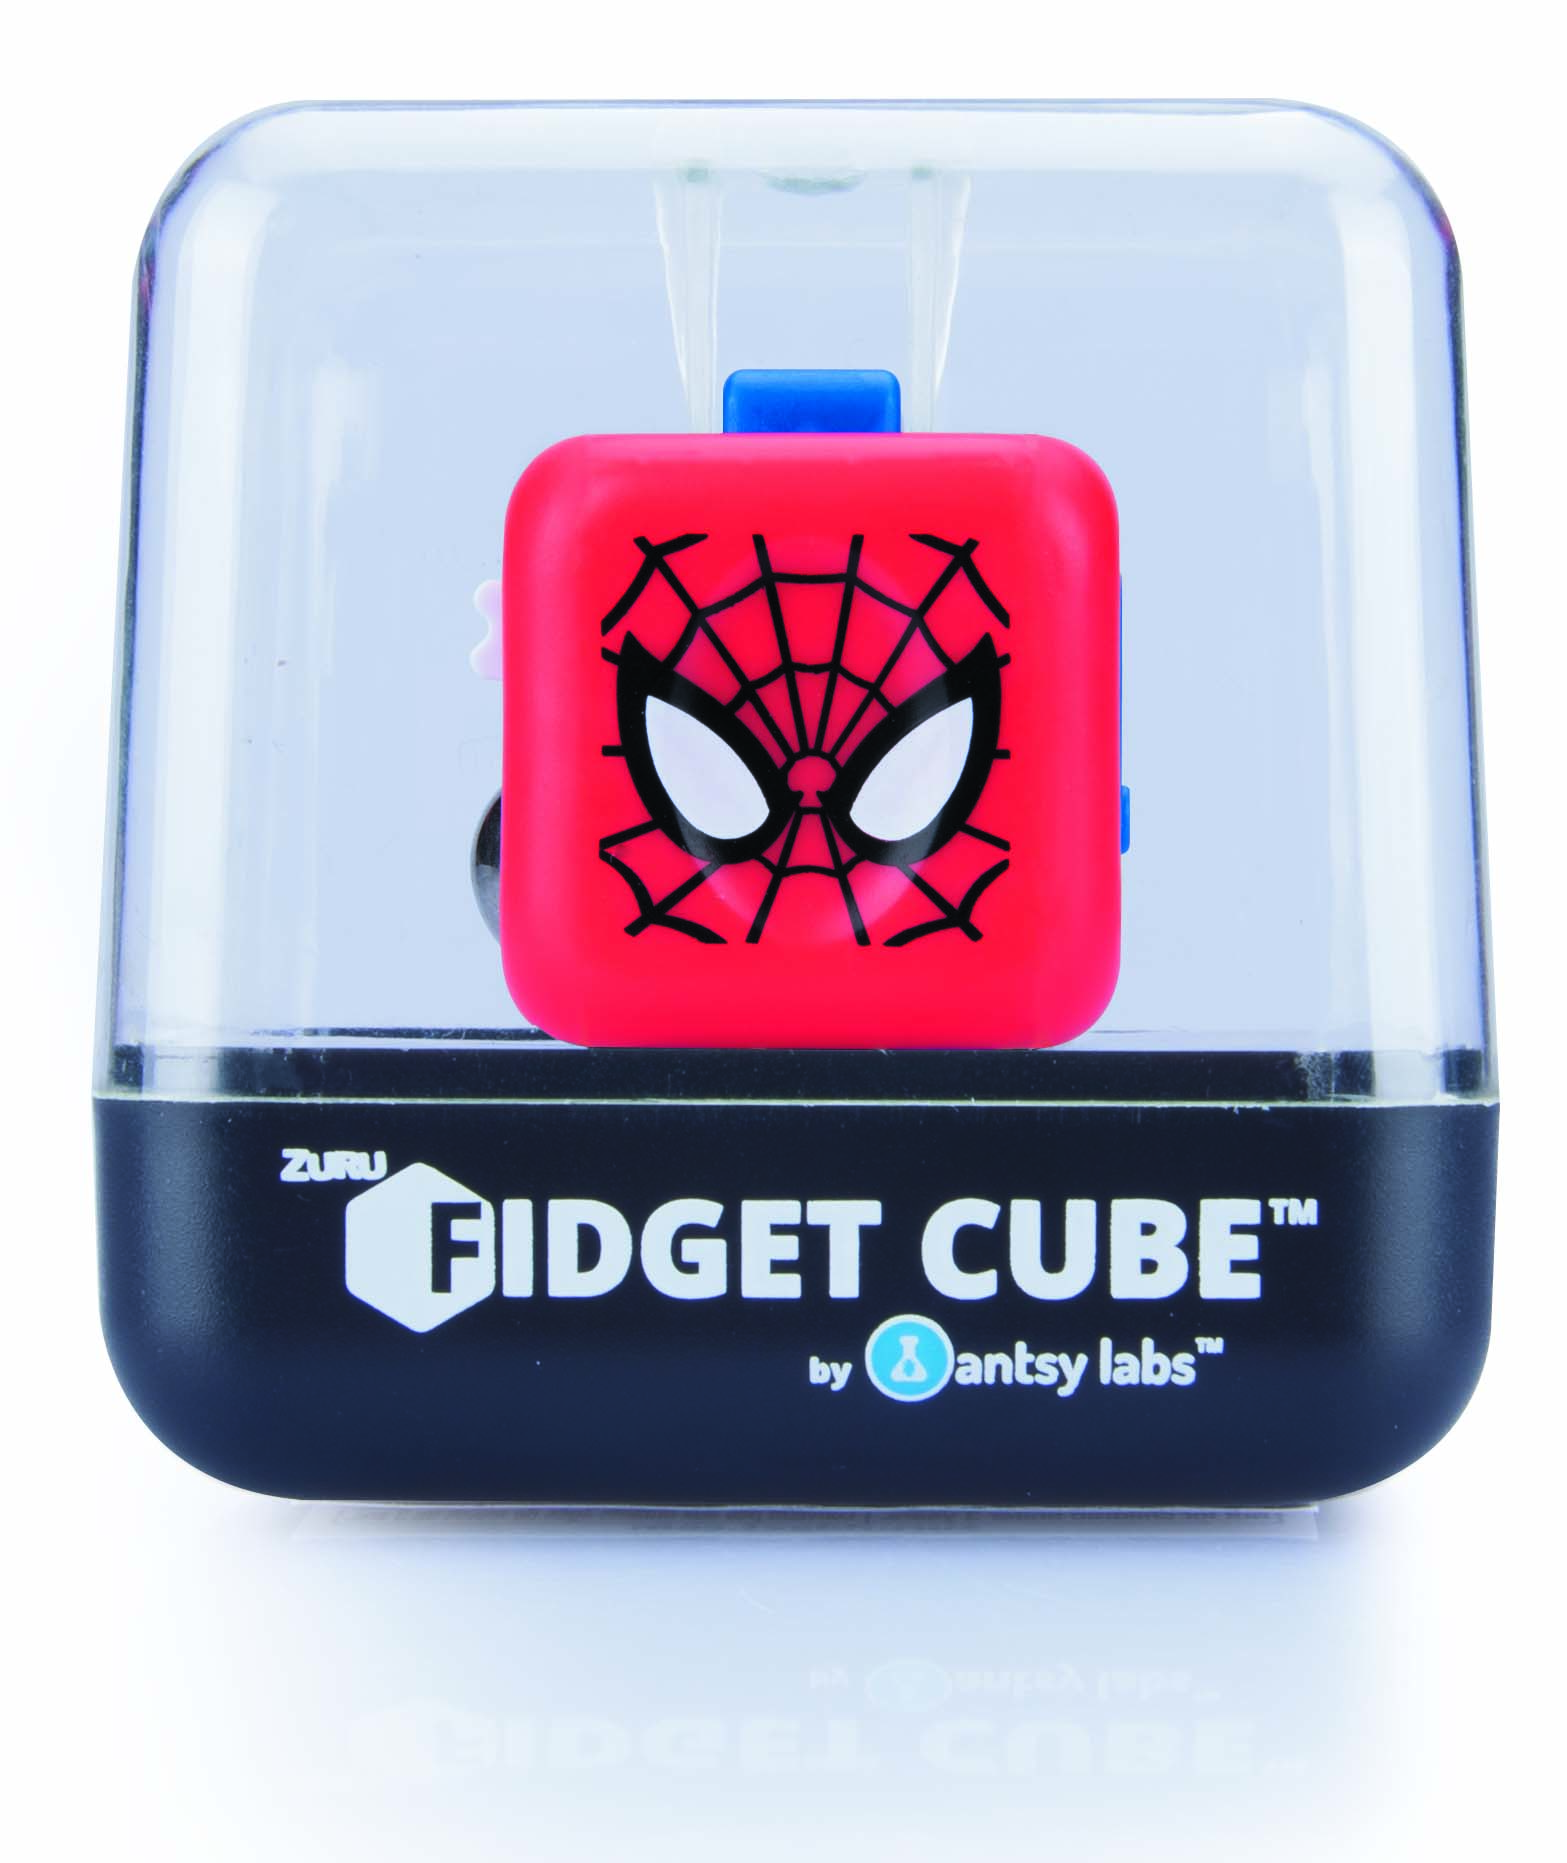 spiderman Marvel Fidget Cube by Antsy Labs Hulk k1 Cpt America iron man